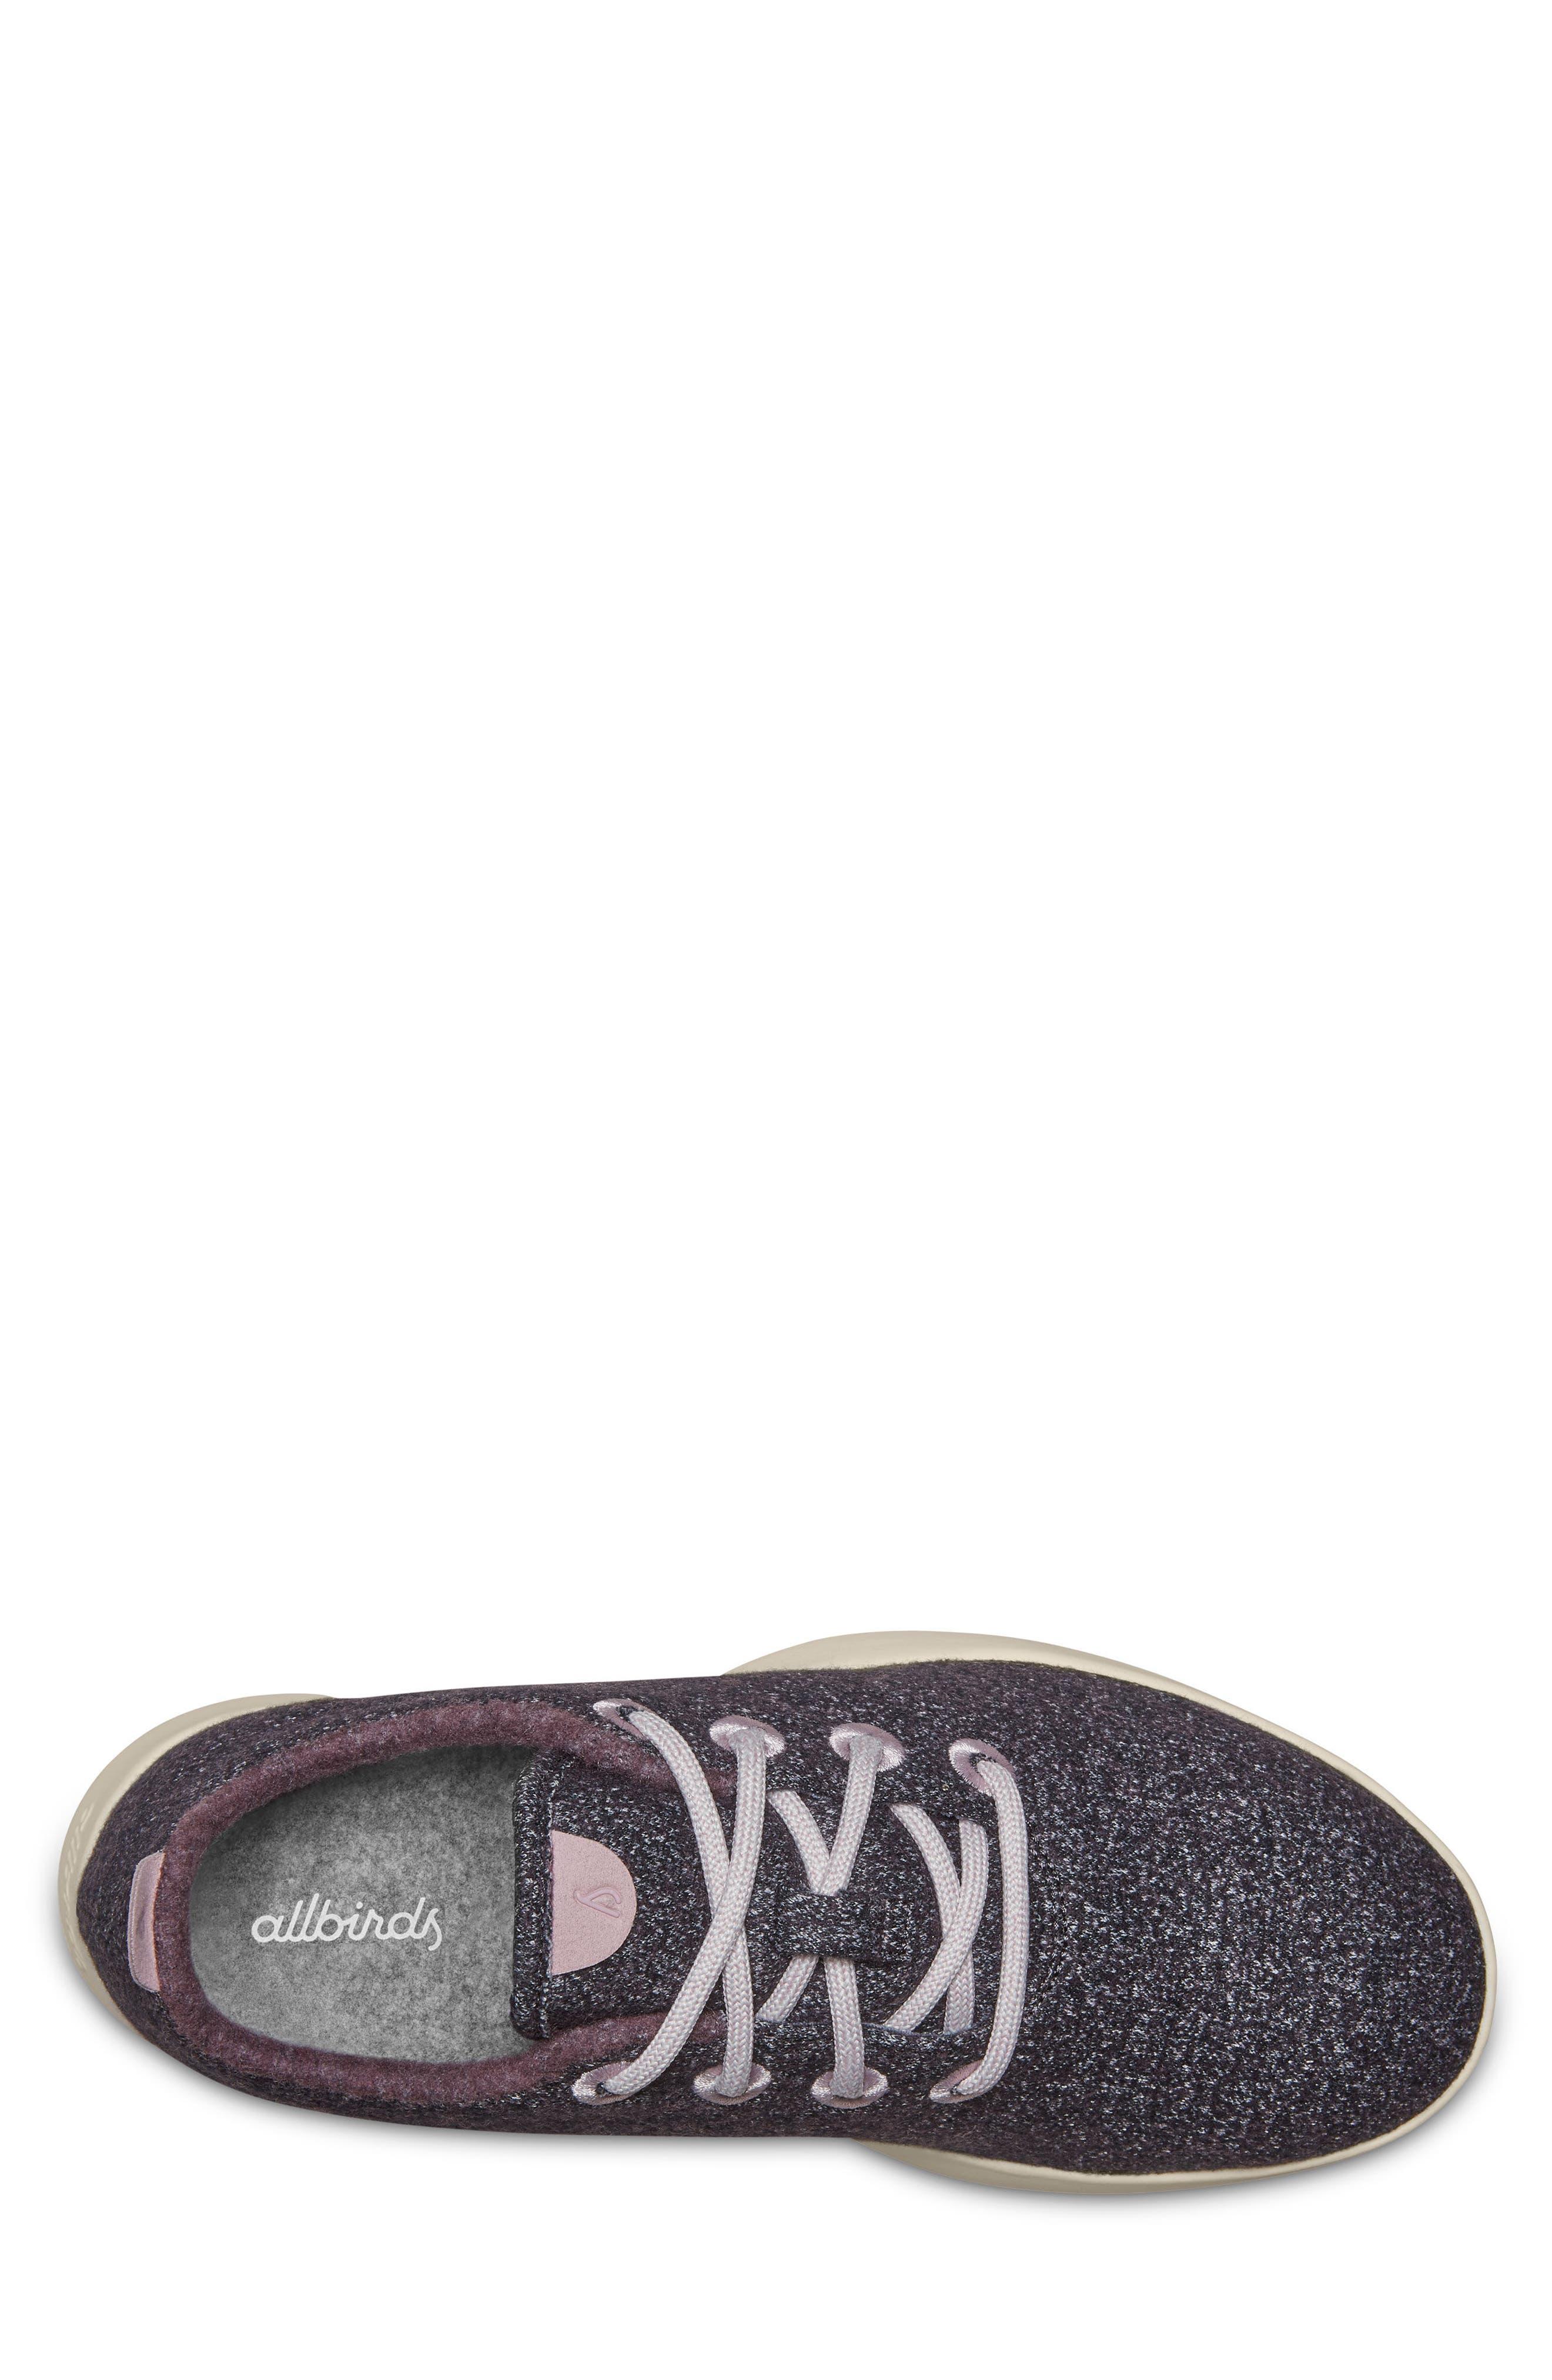 Wool Runner,                             Alternate thumbnail 4, color,                             HAWTHORNE PURPLE WOOL